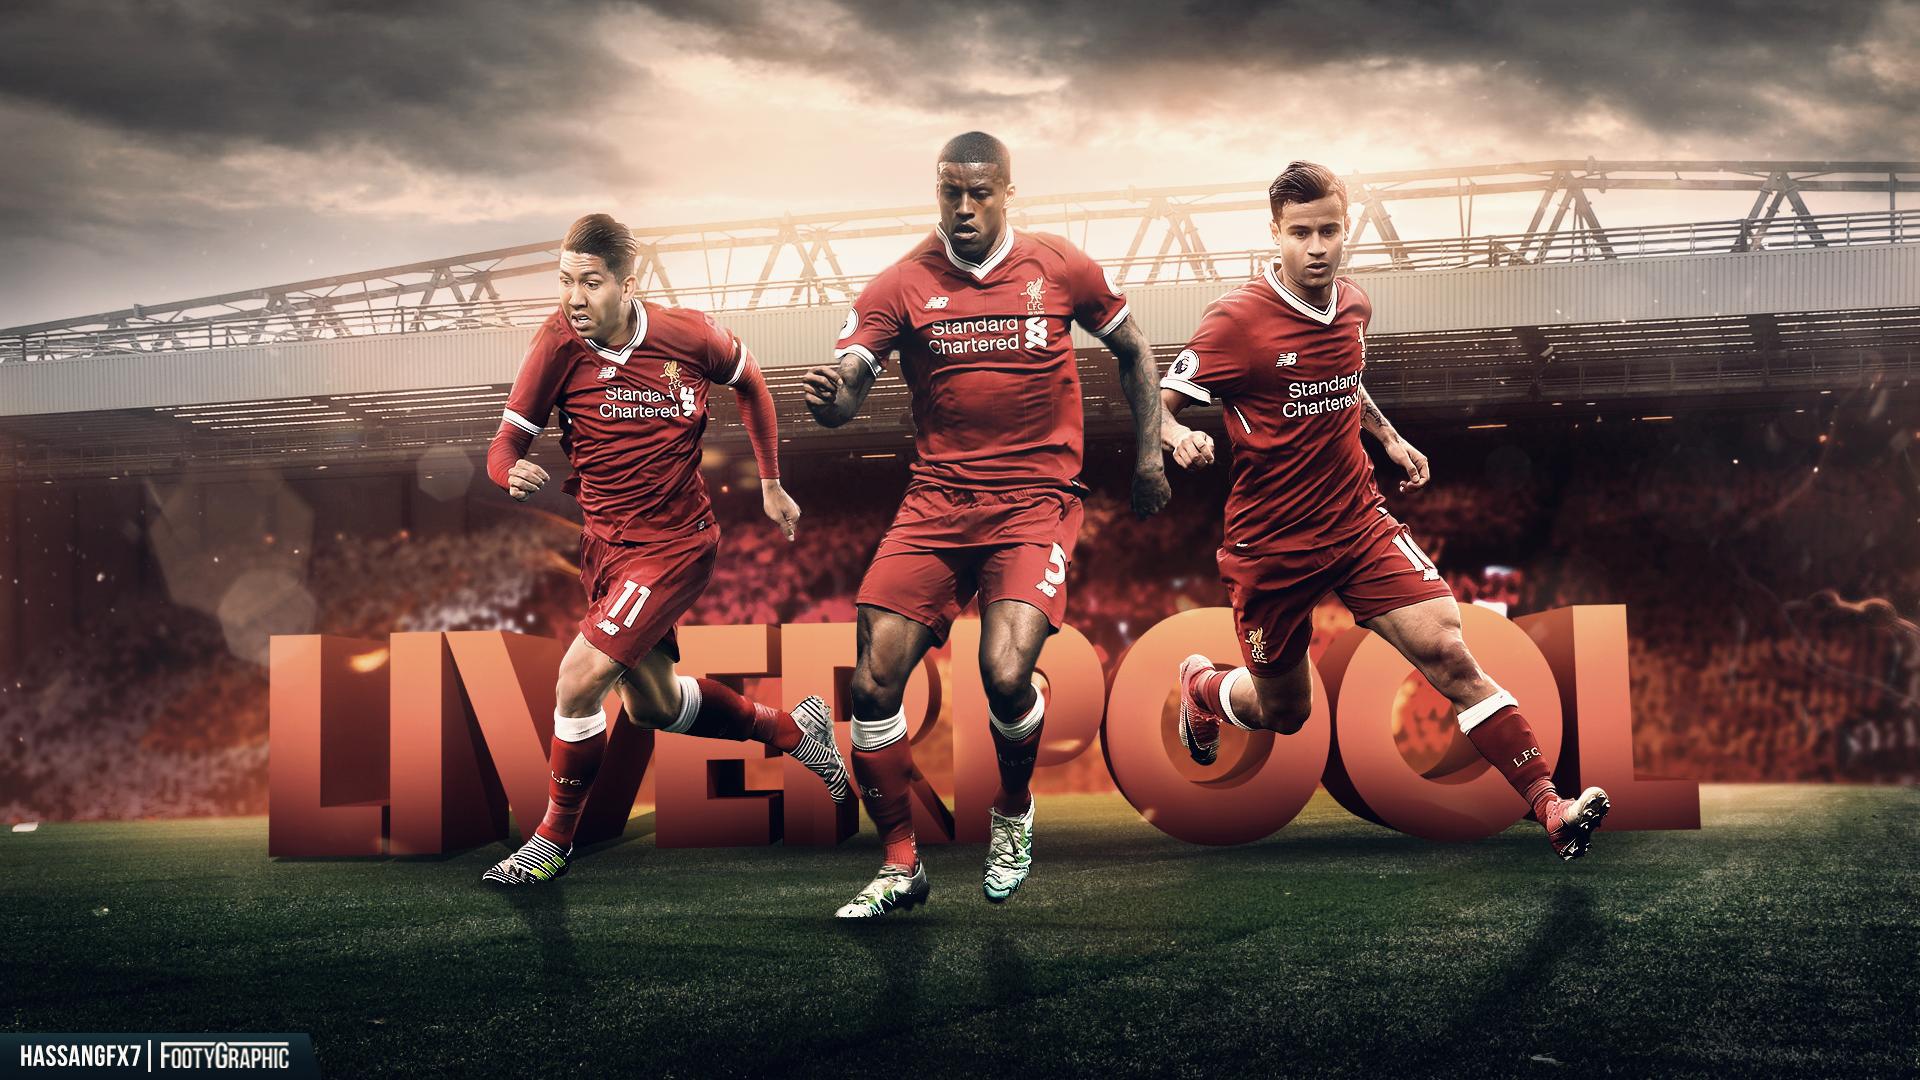 100+ Liverpool FC Wallpapers on WallpaperSafari